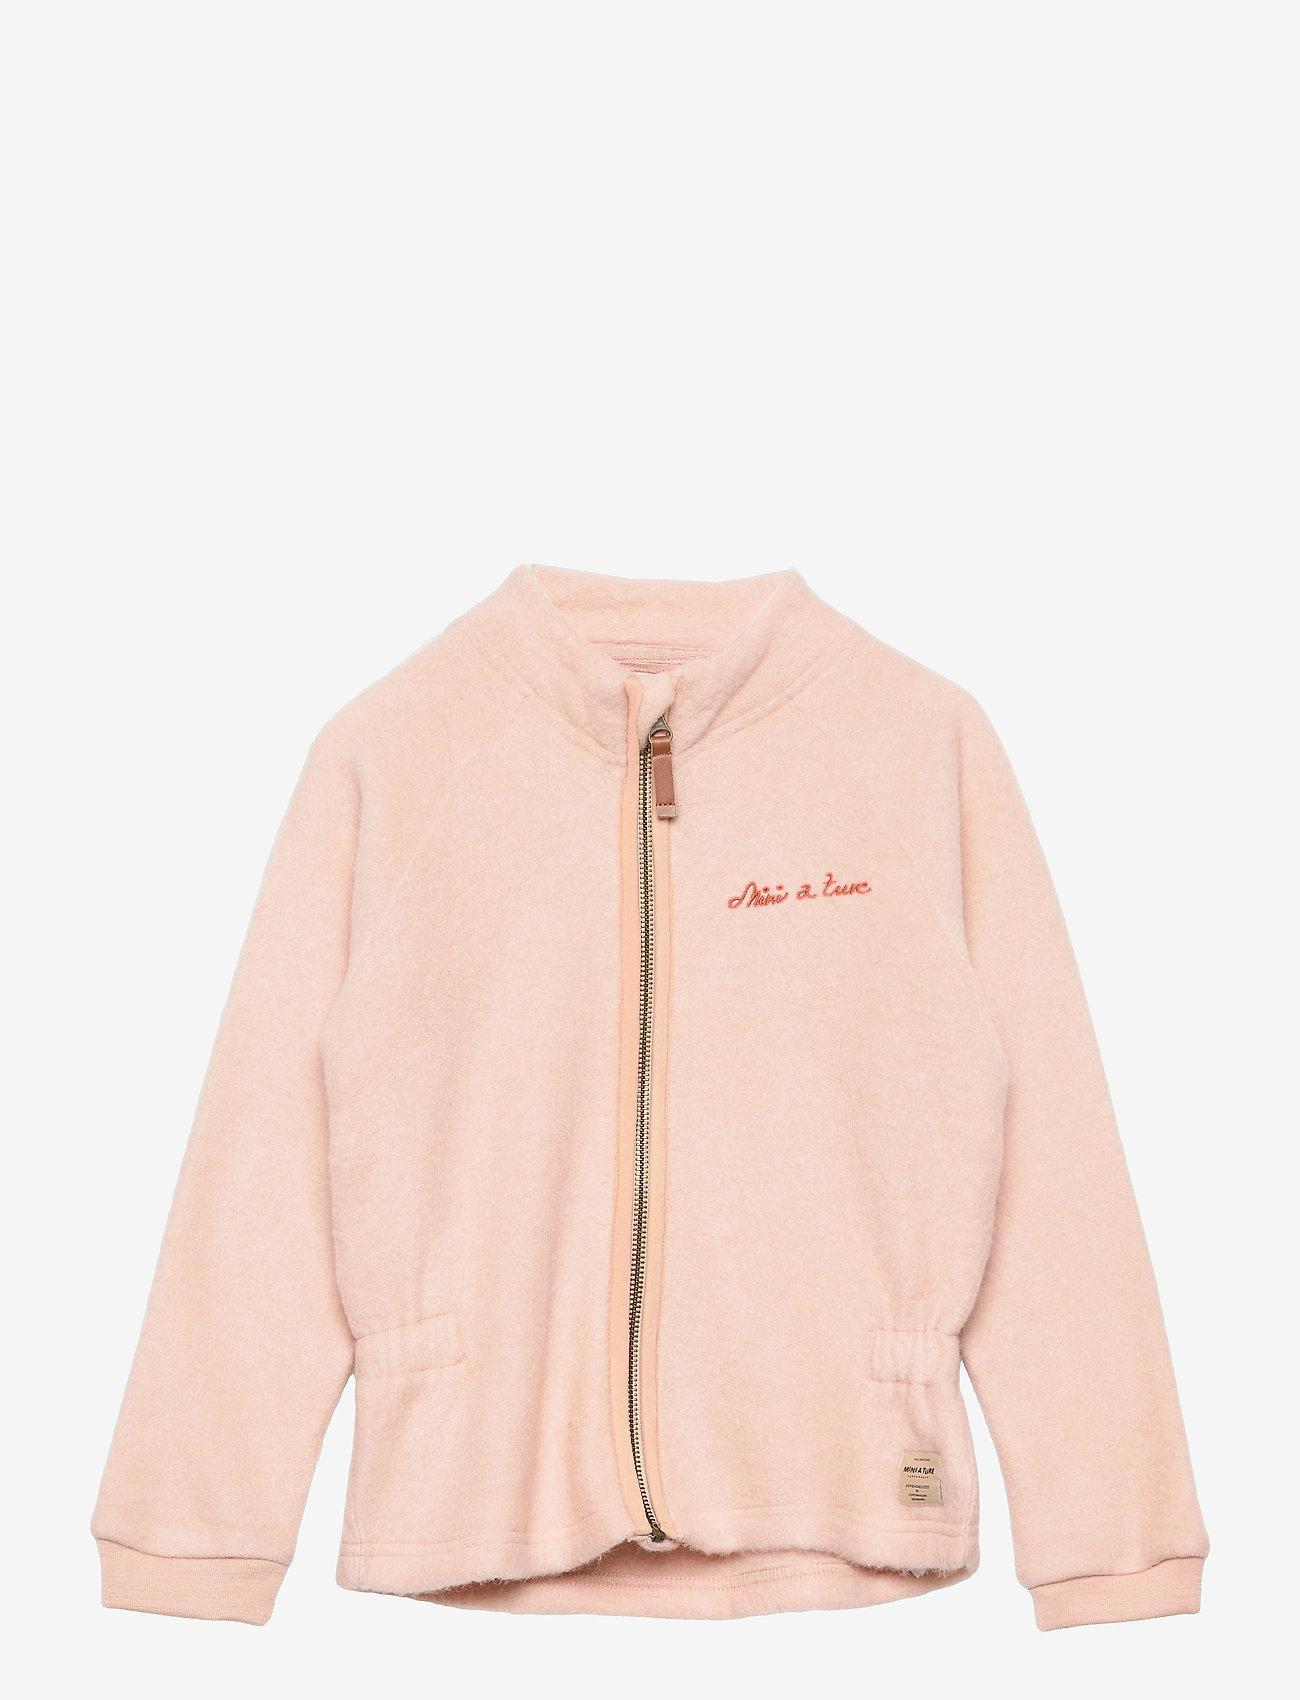 Mini A Ture - Lola Jacket, MK - fleecejakke - rose dust - 0